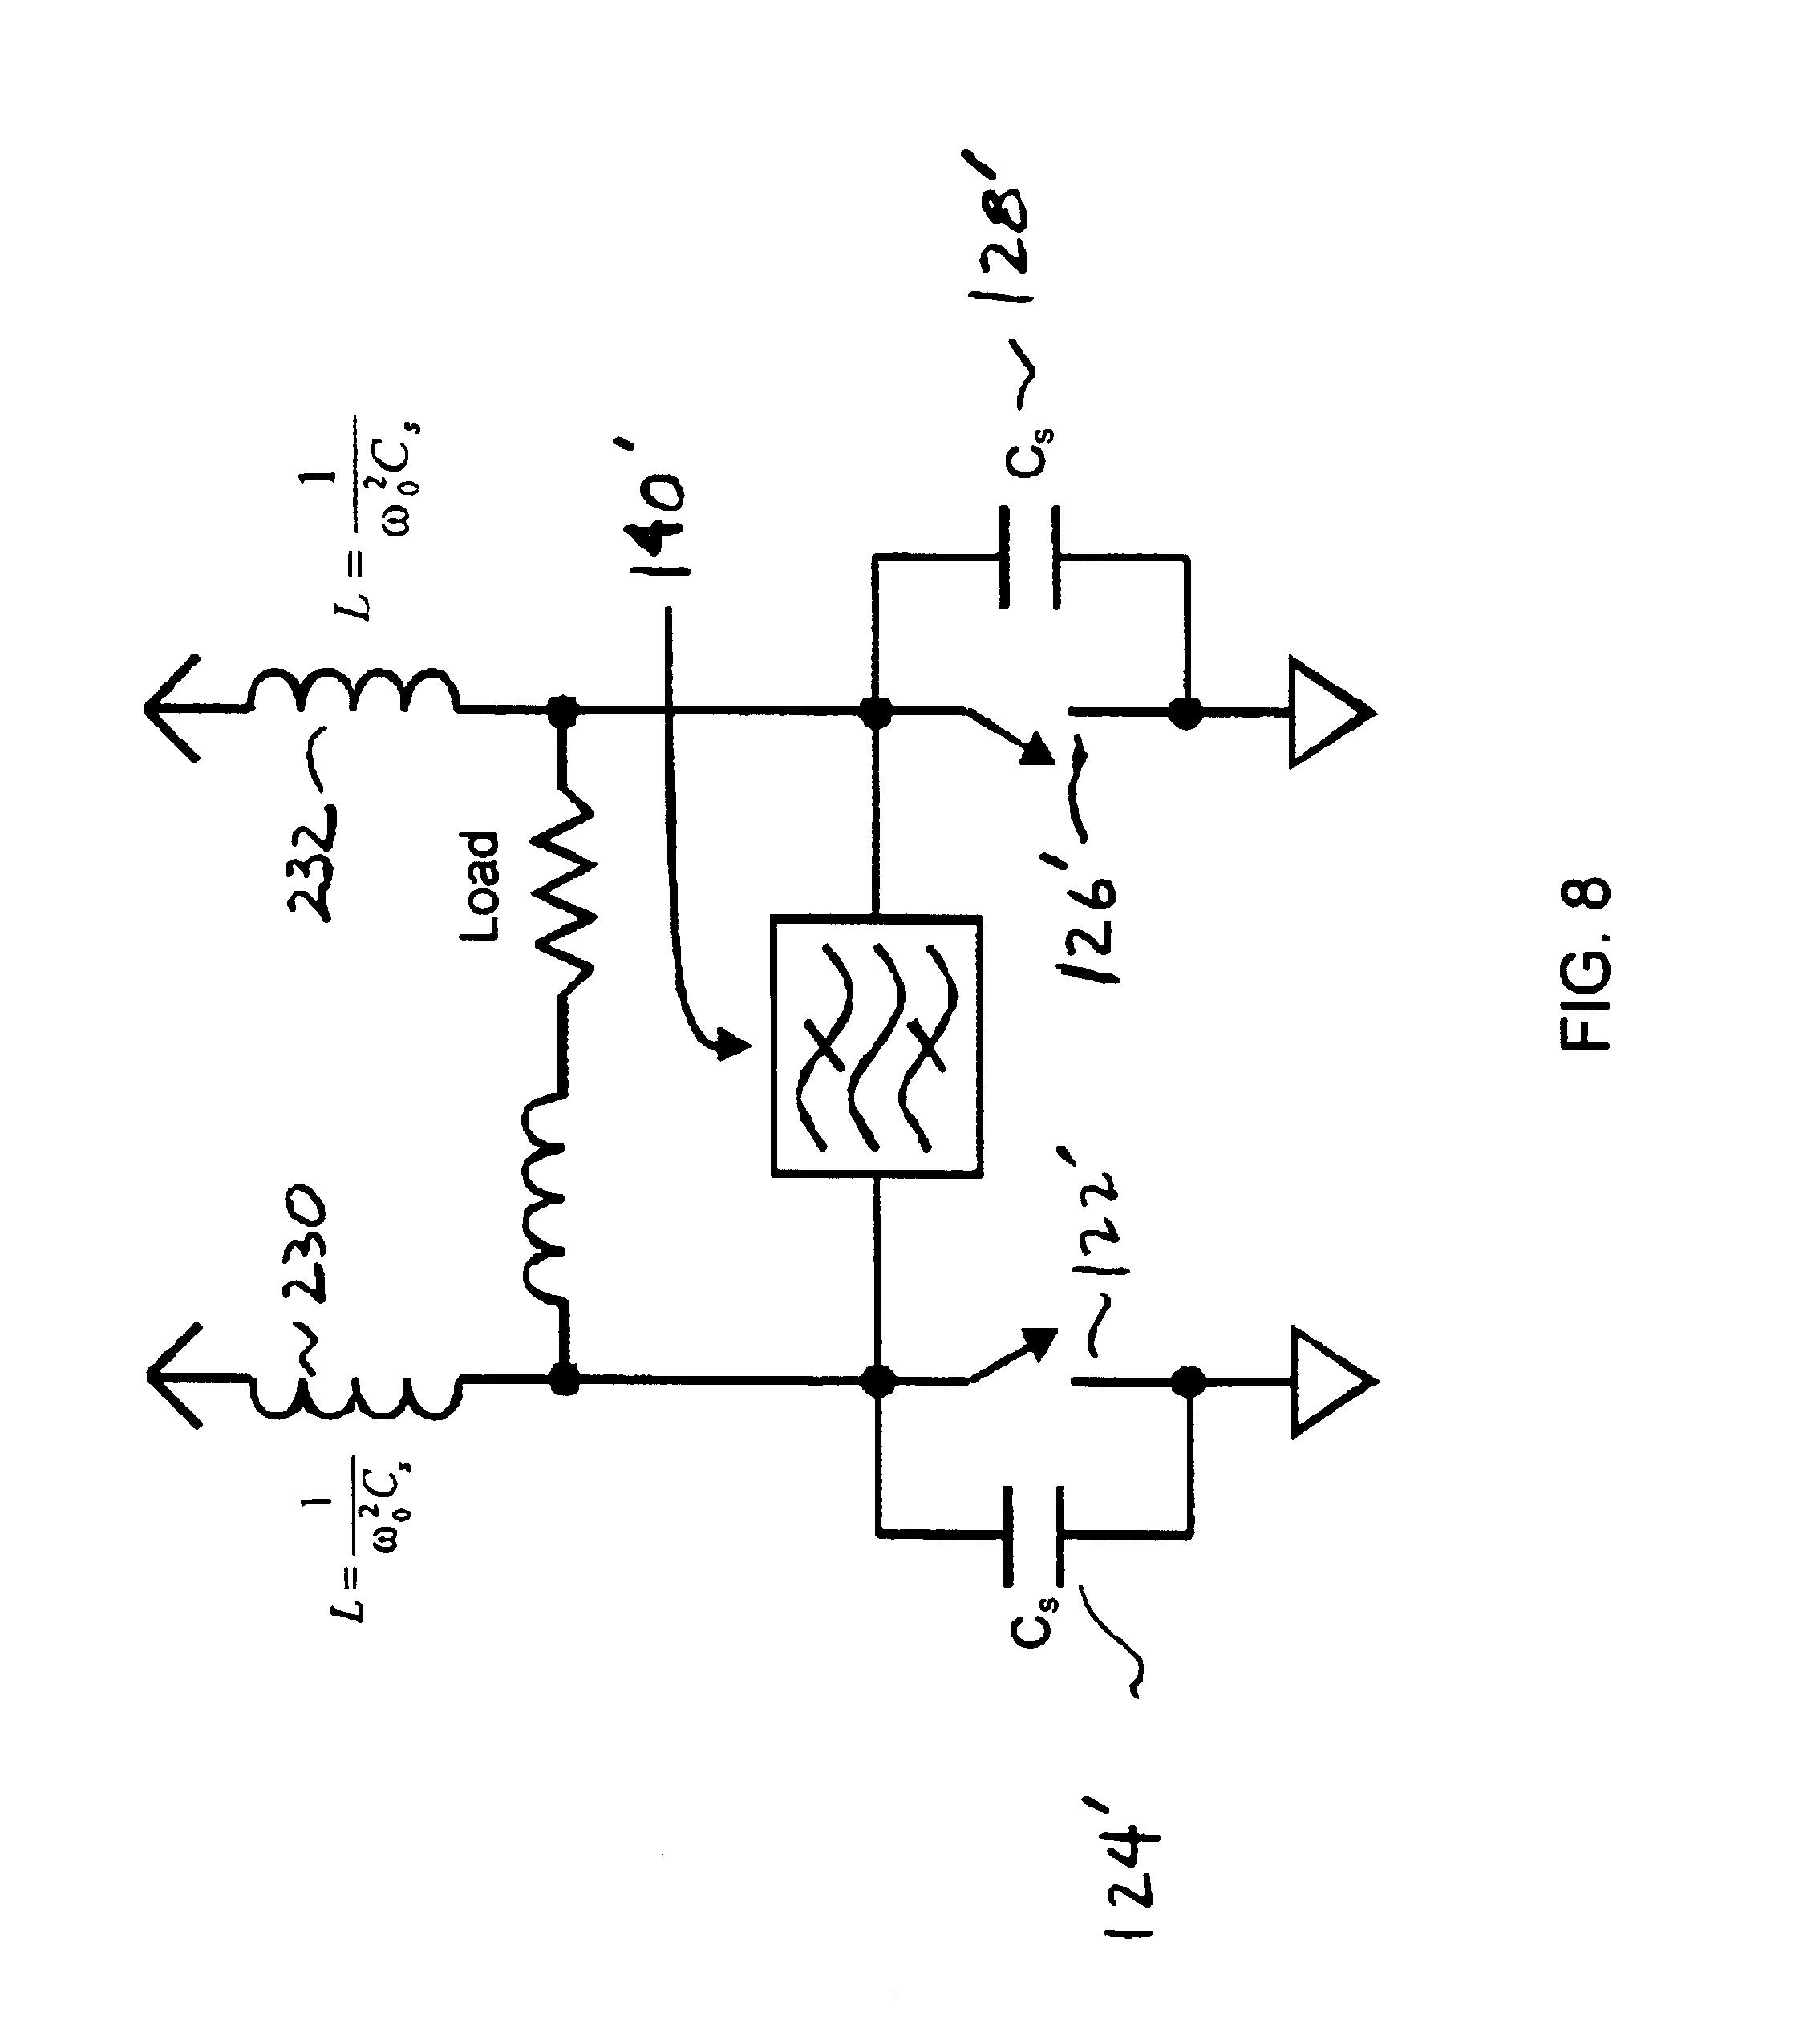 short circuit open circuit capacitance loss